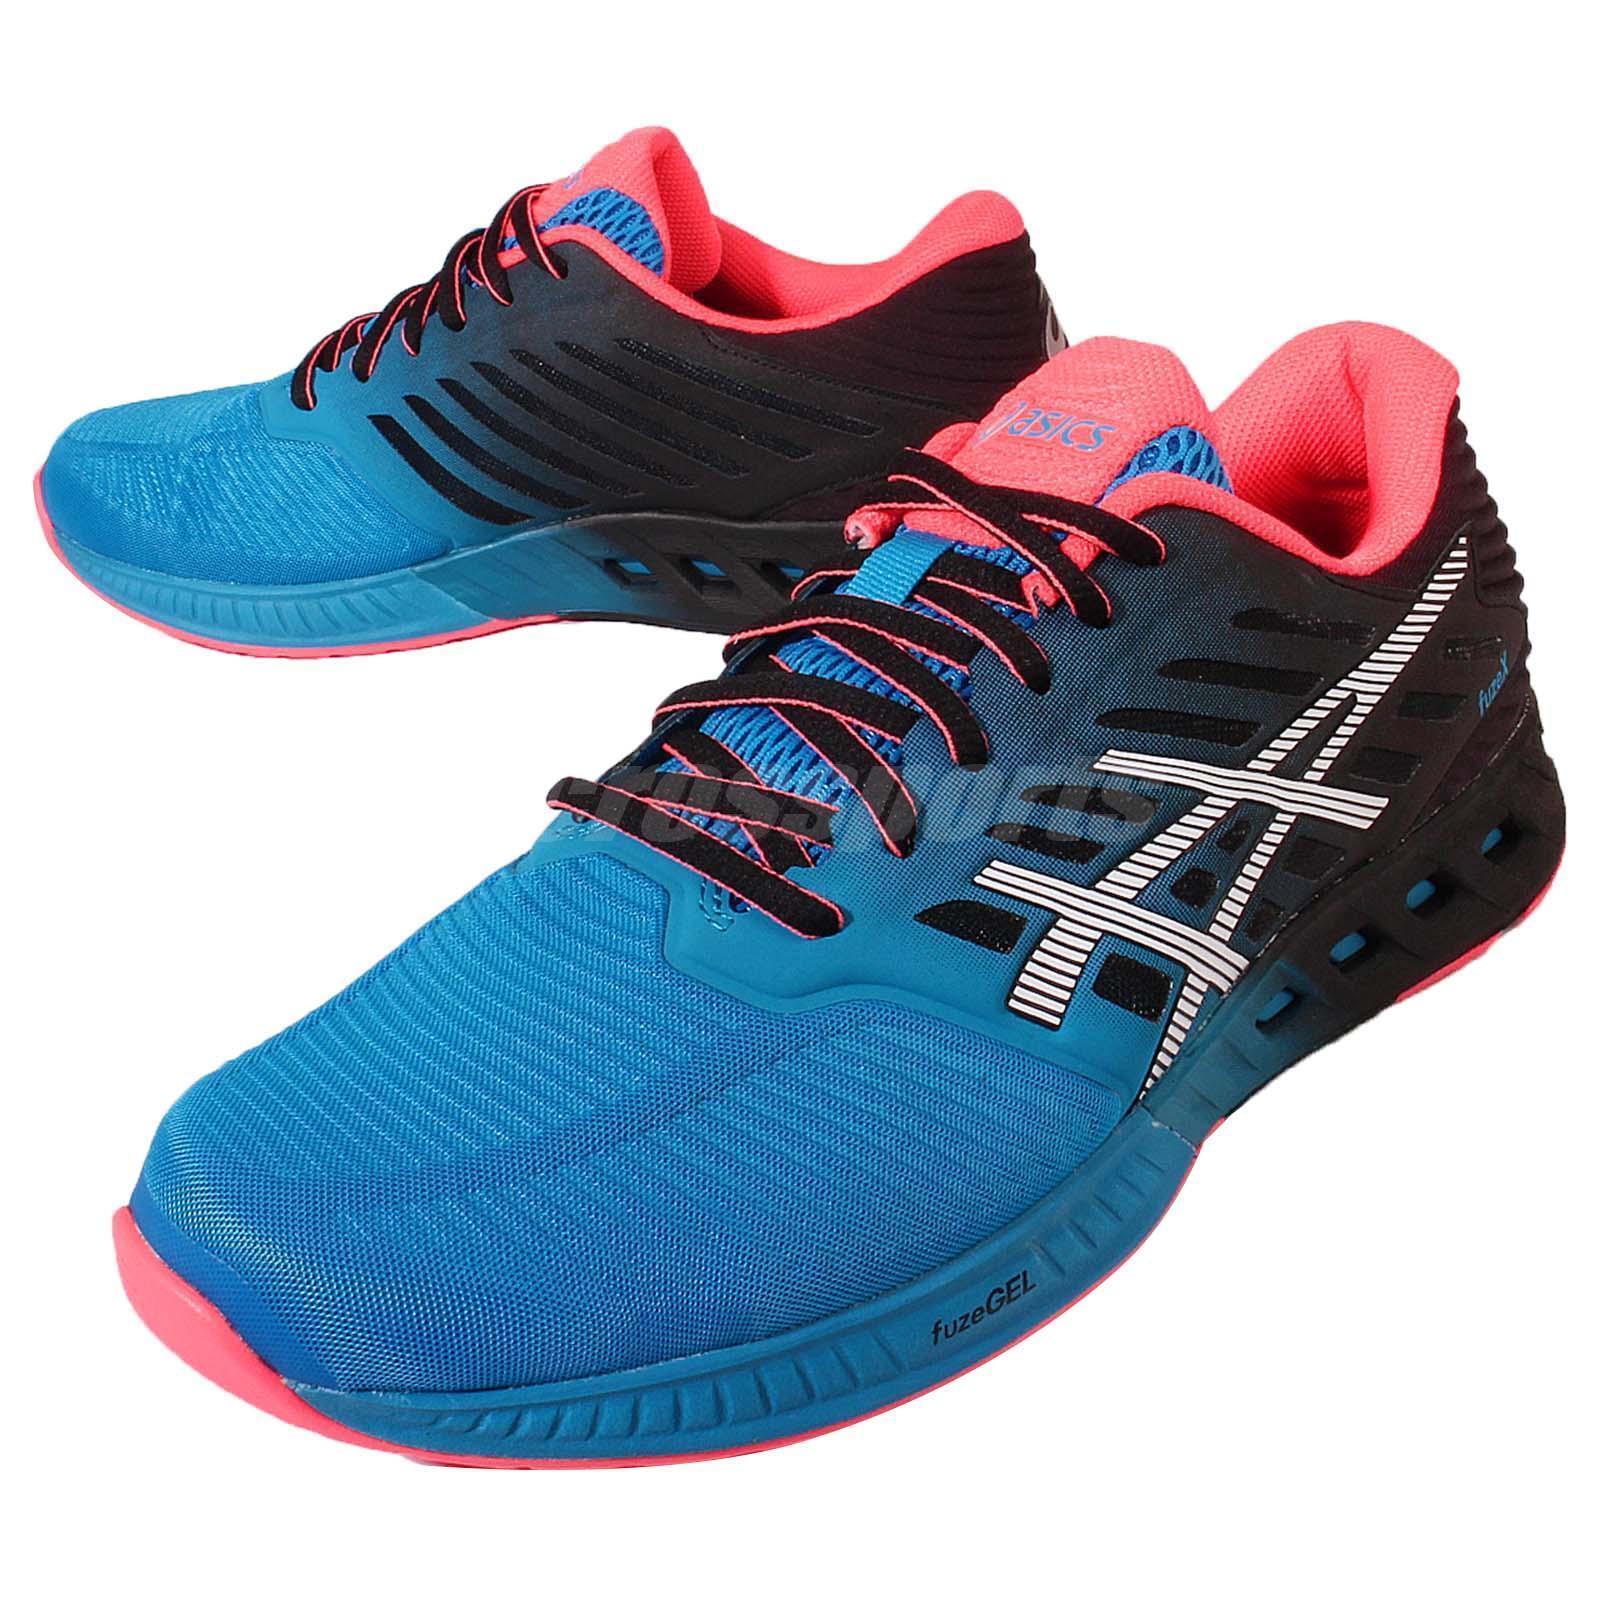 Asics FuzeX Bleu Noir Rouge Gel Mens Running Chaussures Trainers Gel Rouge T639N-4201 1b3a81